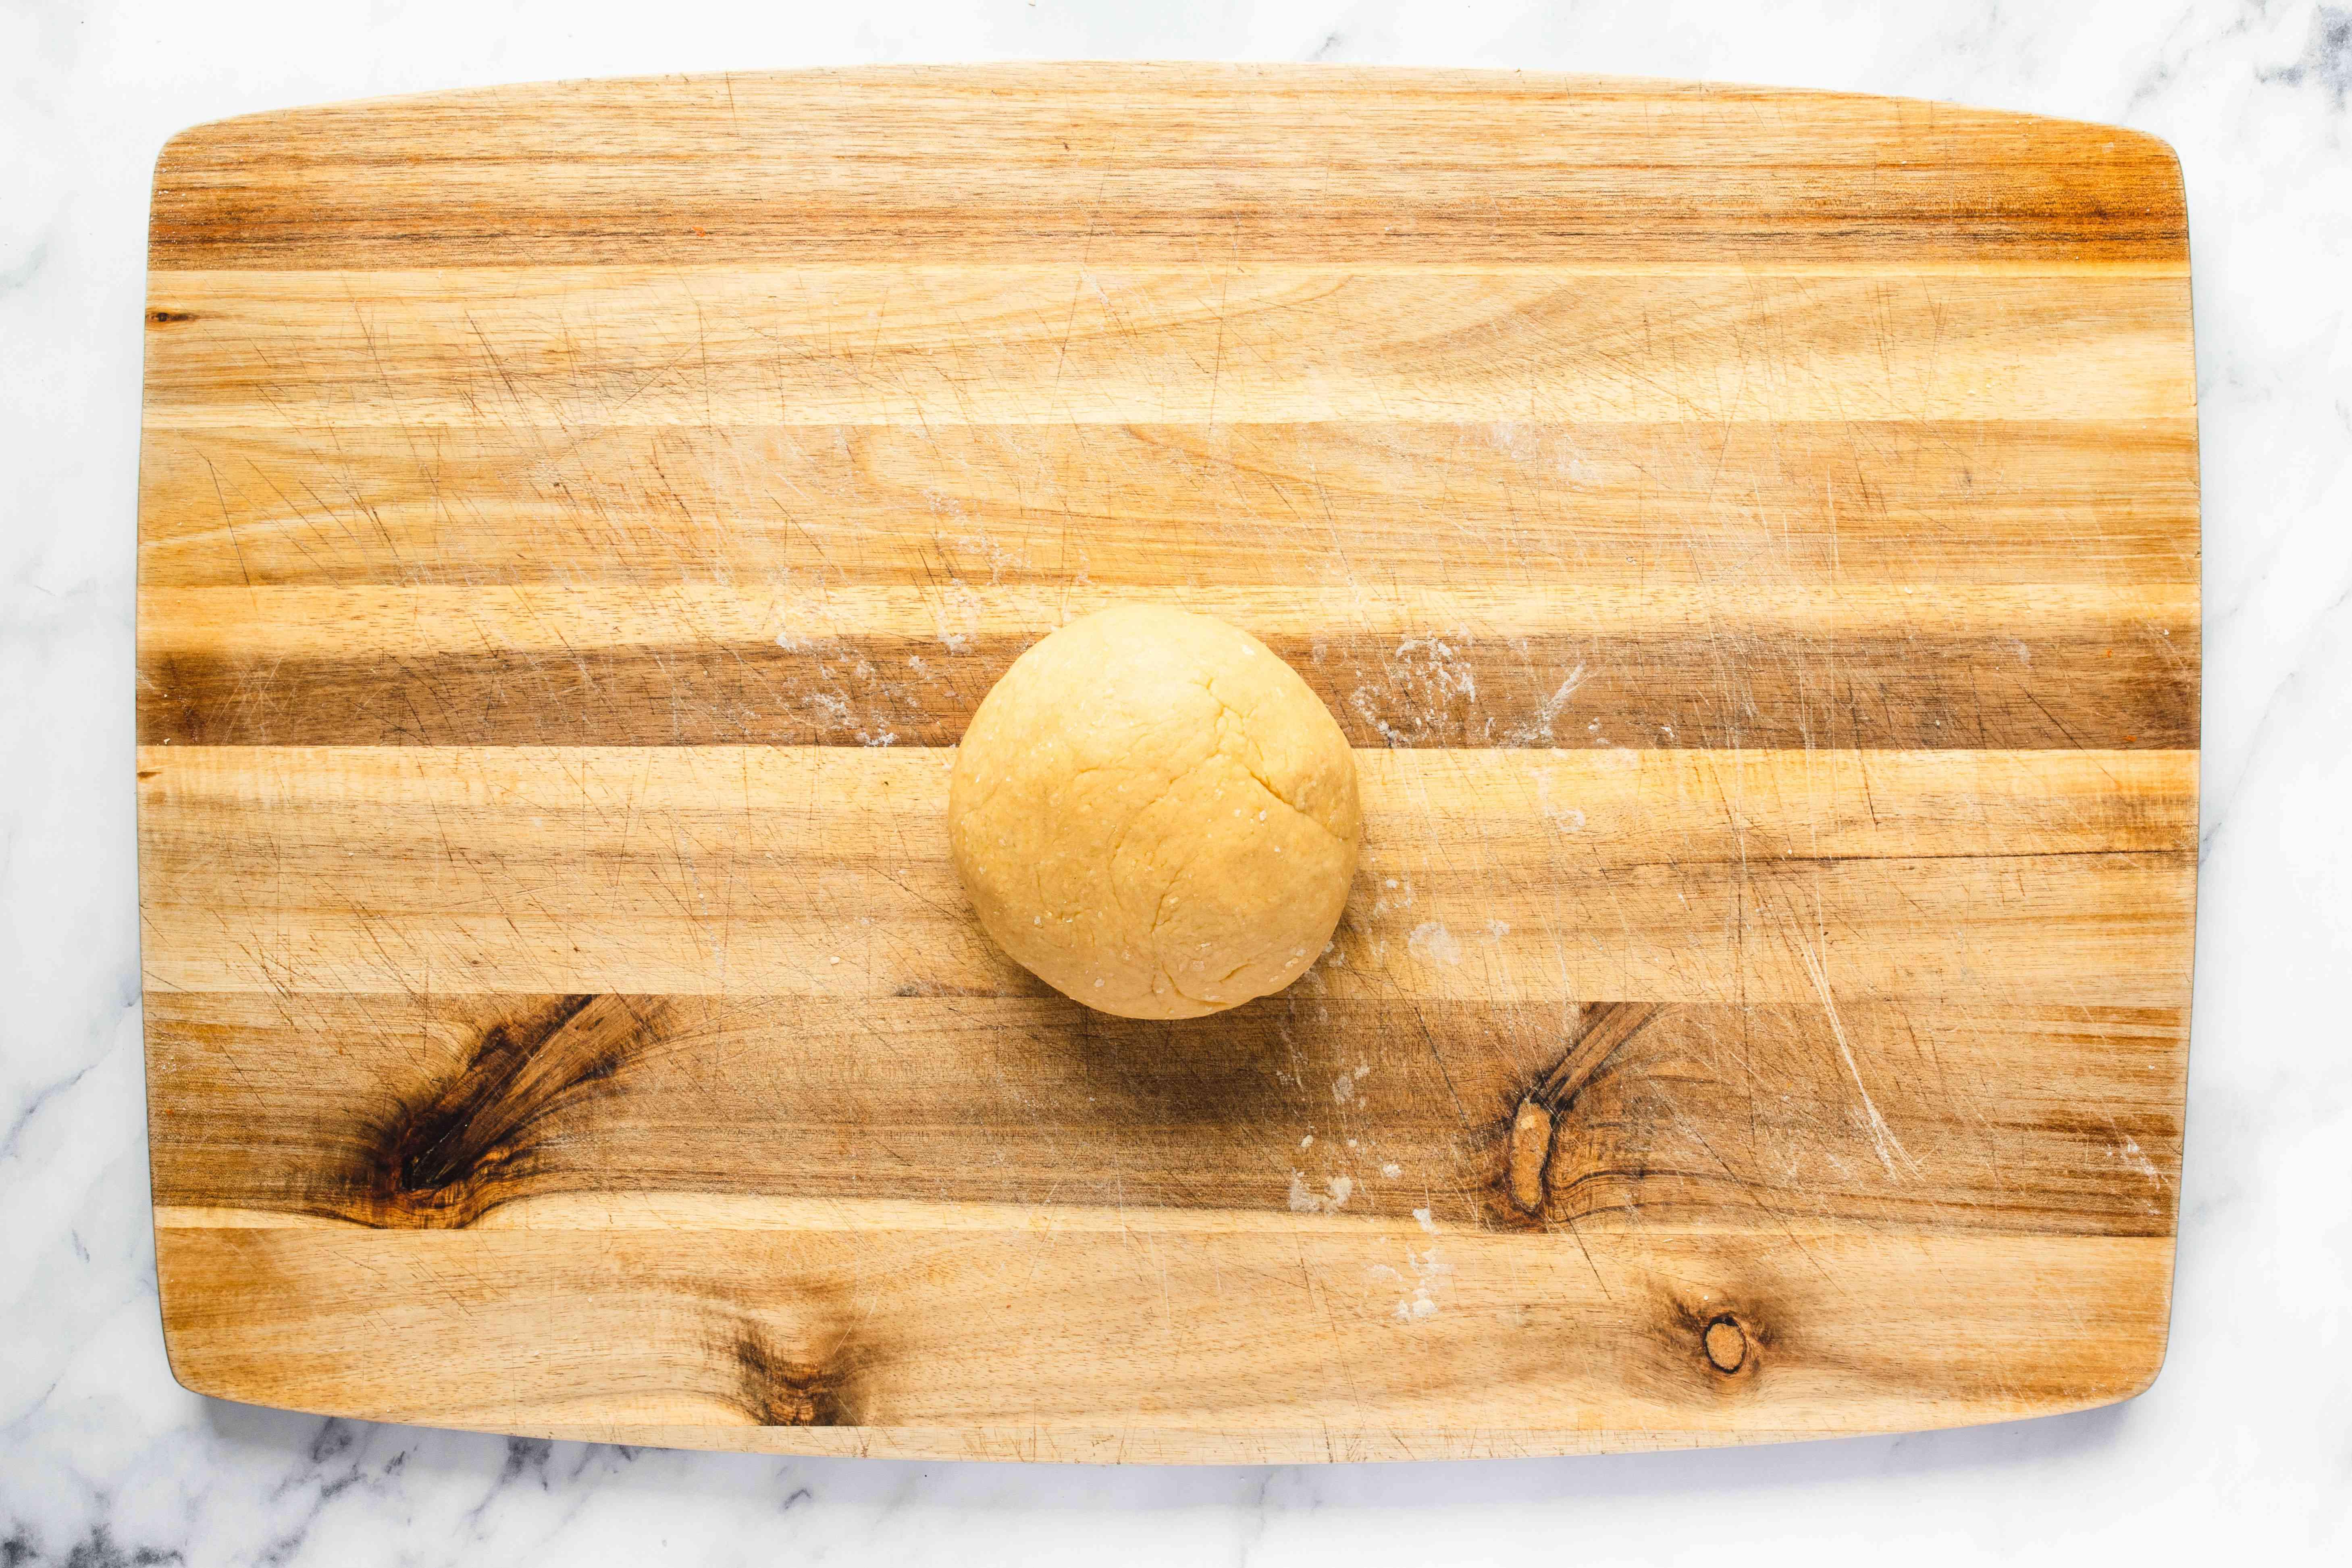 Sift flour and create dough for pandoro cake